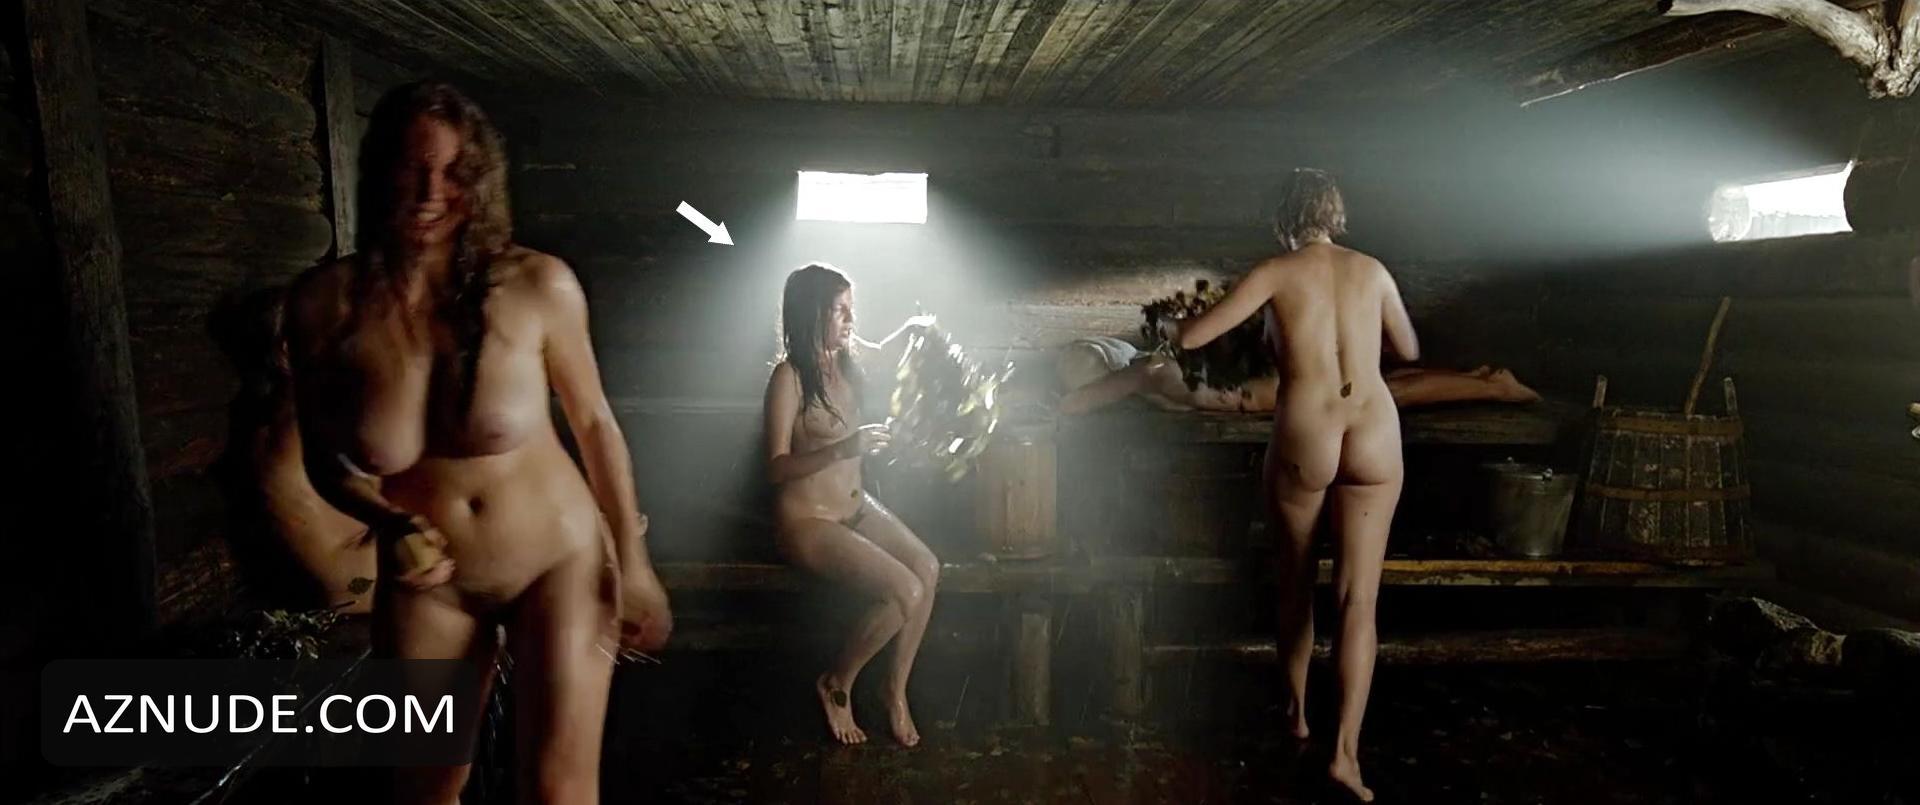 Tits Anastasiya Mikulchina nude (96 foto and video), Pussy, Sideboobs, Selfie, butt 2017